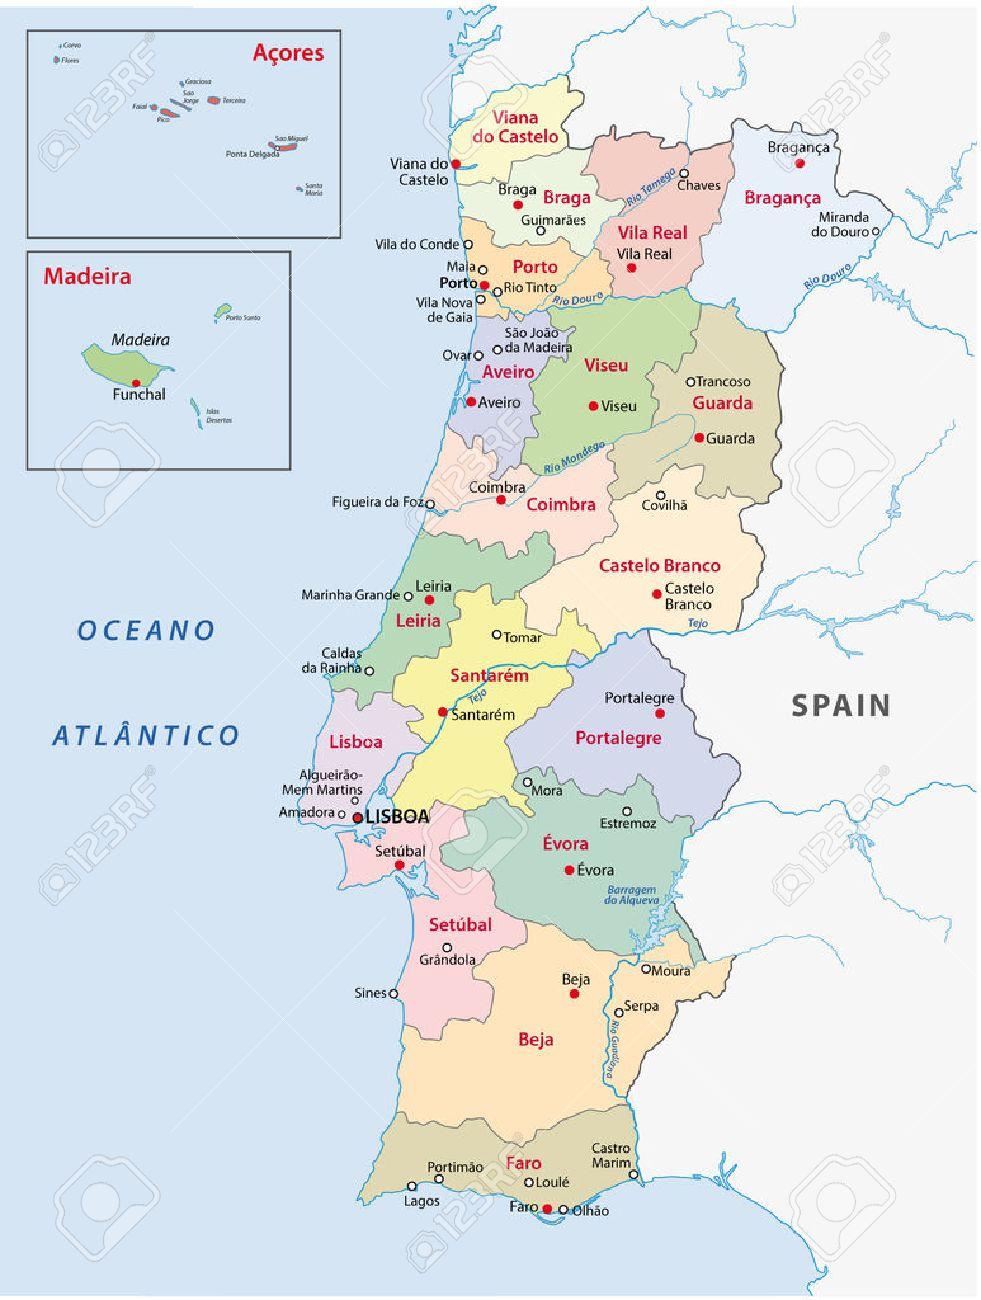 Portugal Mapa Administrativo Royalty Free Cliparts Vetores E - Portugal mapa